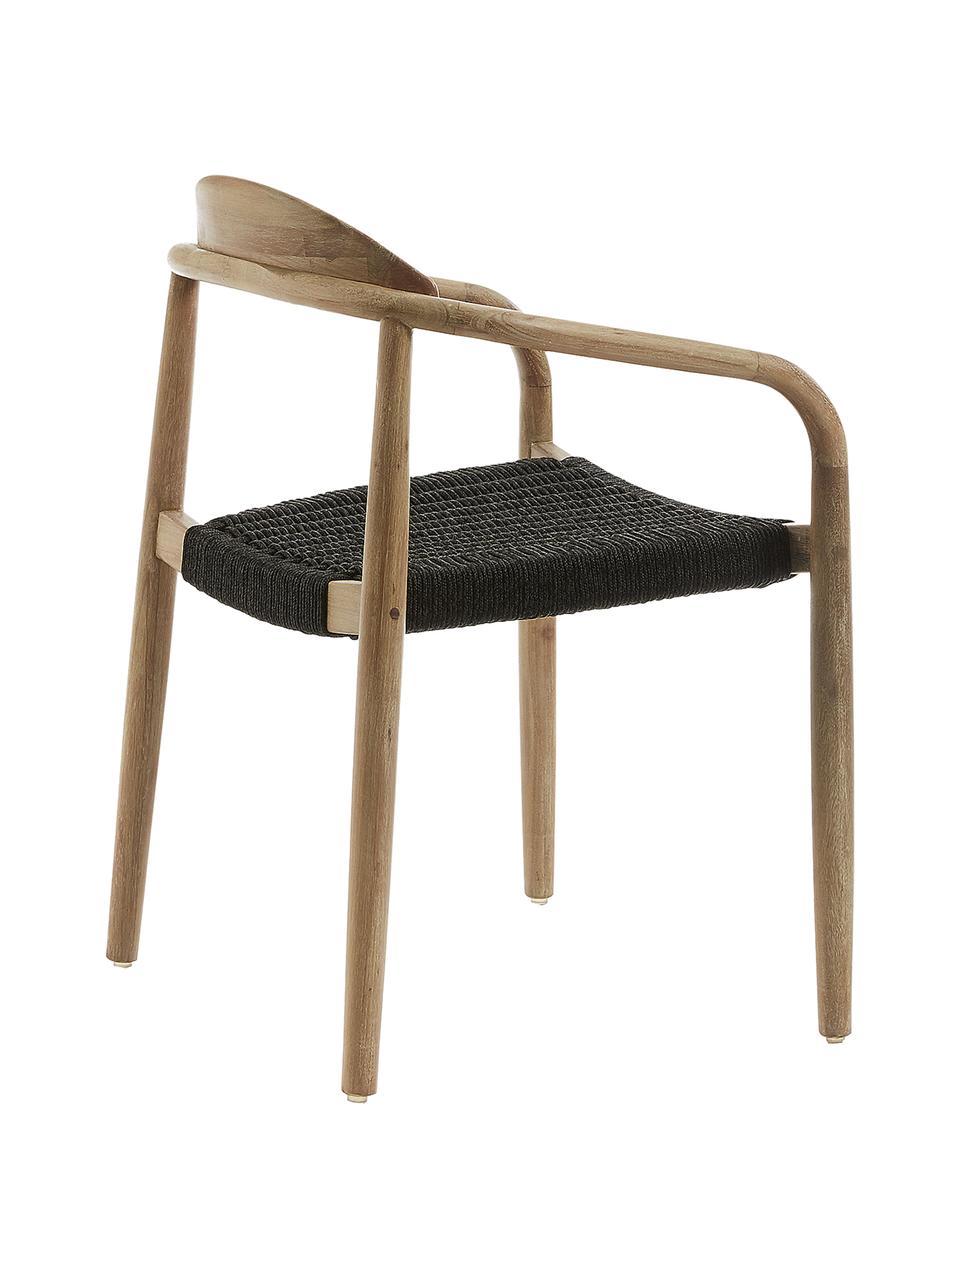 Armlehnstuhl Nina aus Massivholz, Gestell: Massives Eukalyptusholz, Sitzfläche: Polyester, UV-beständig, Braun, Dunkelgrau, B 56 x T 53 cm